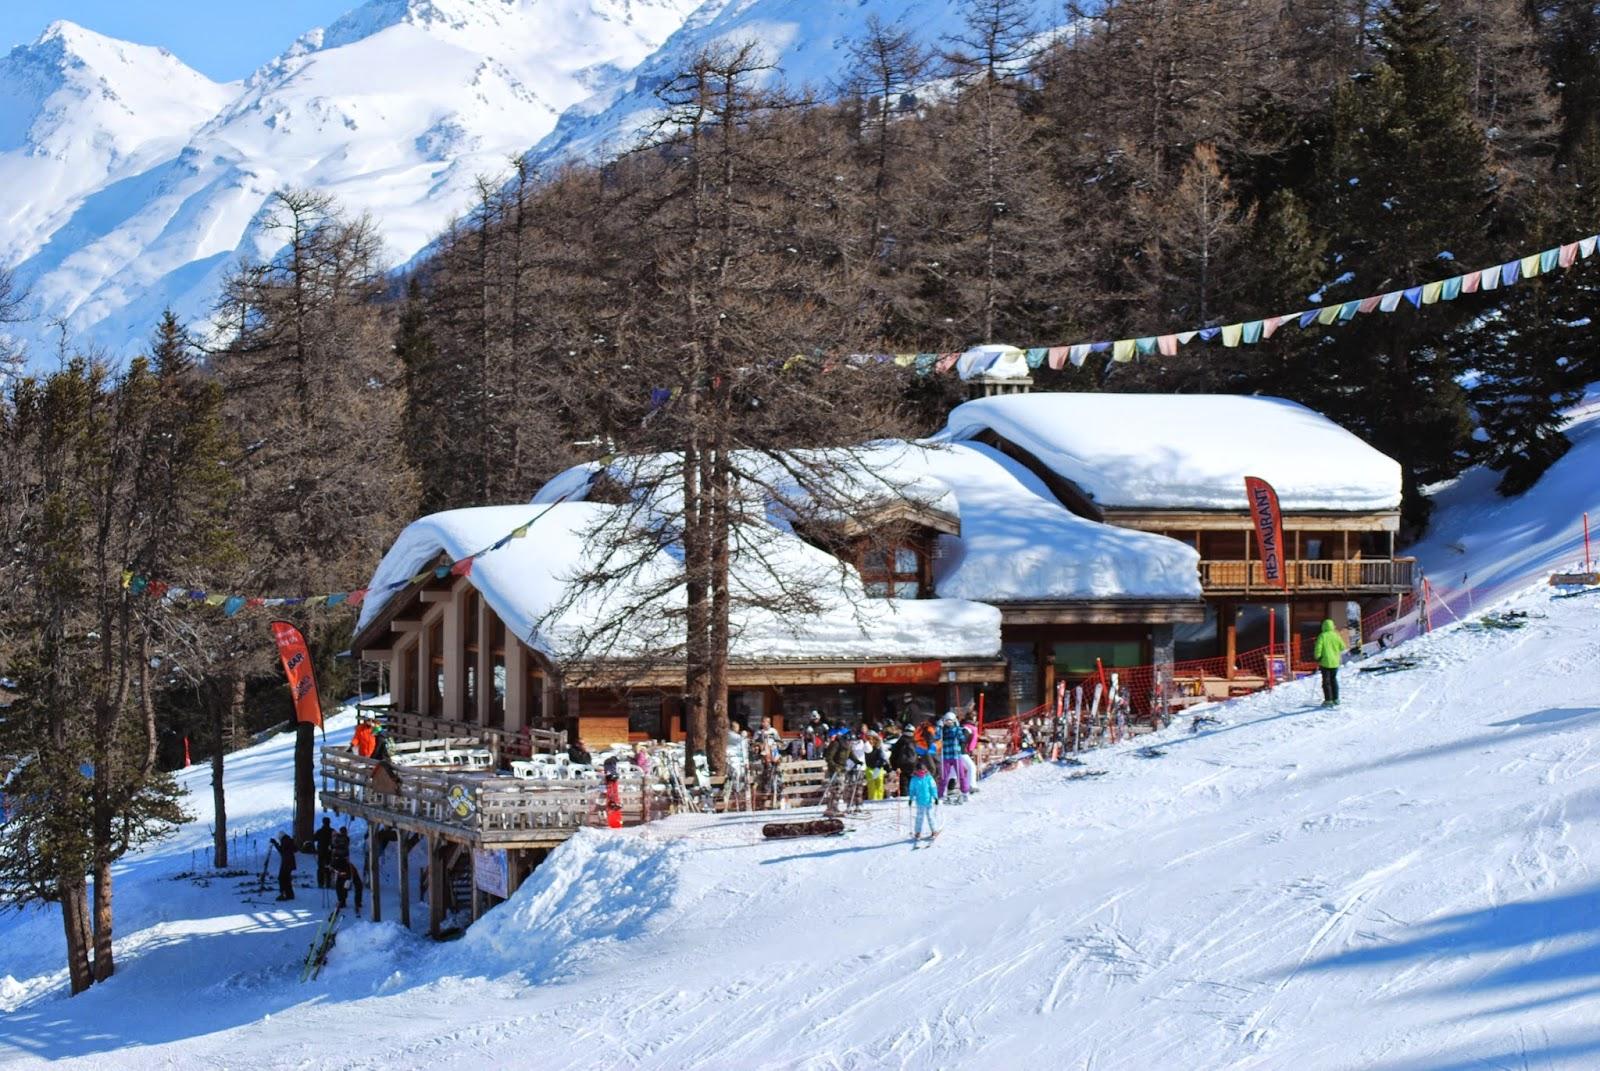 Restaurant d 39 altitude chalet la fema - Restaurant d altitude chamrousse ...